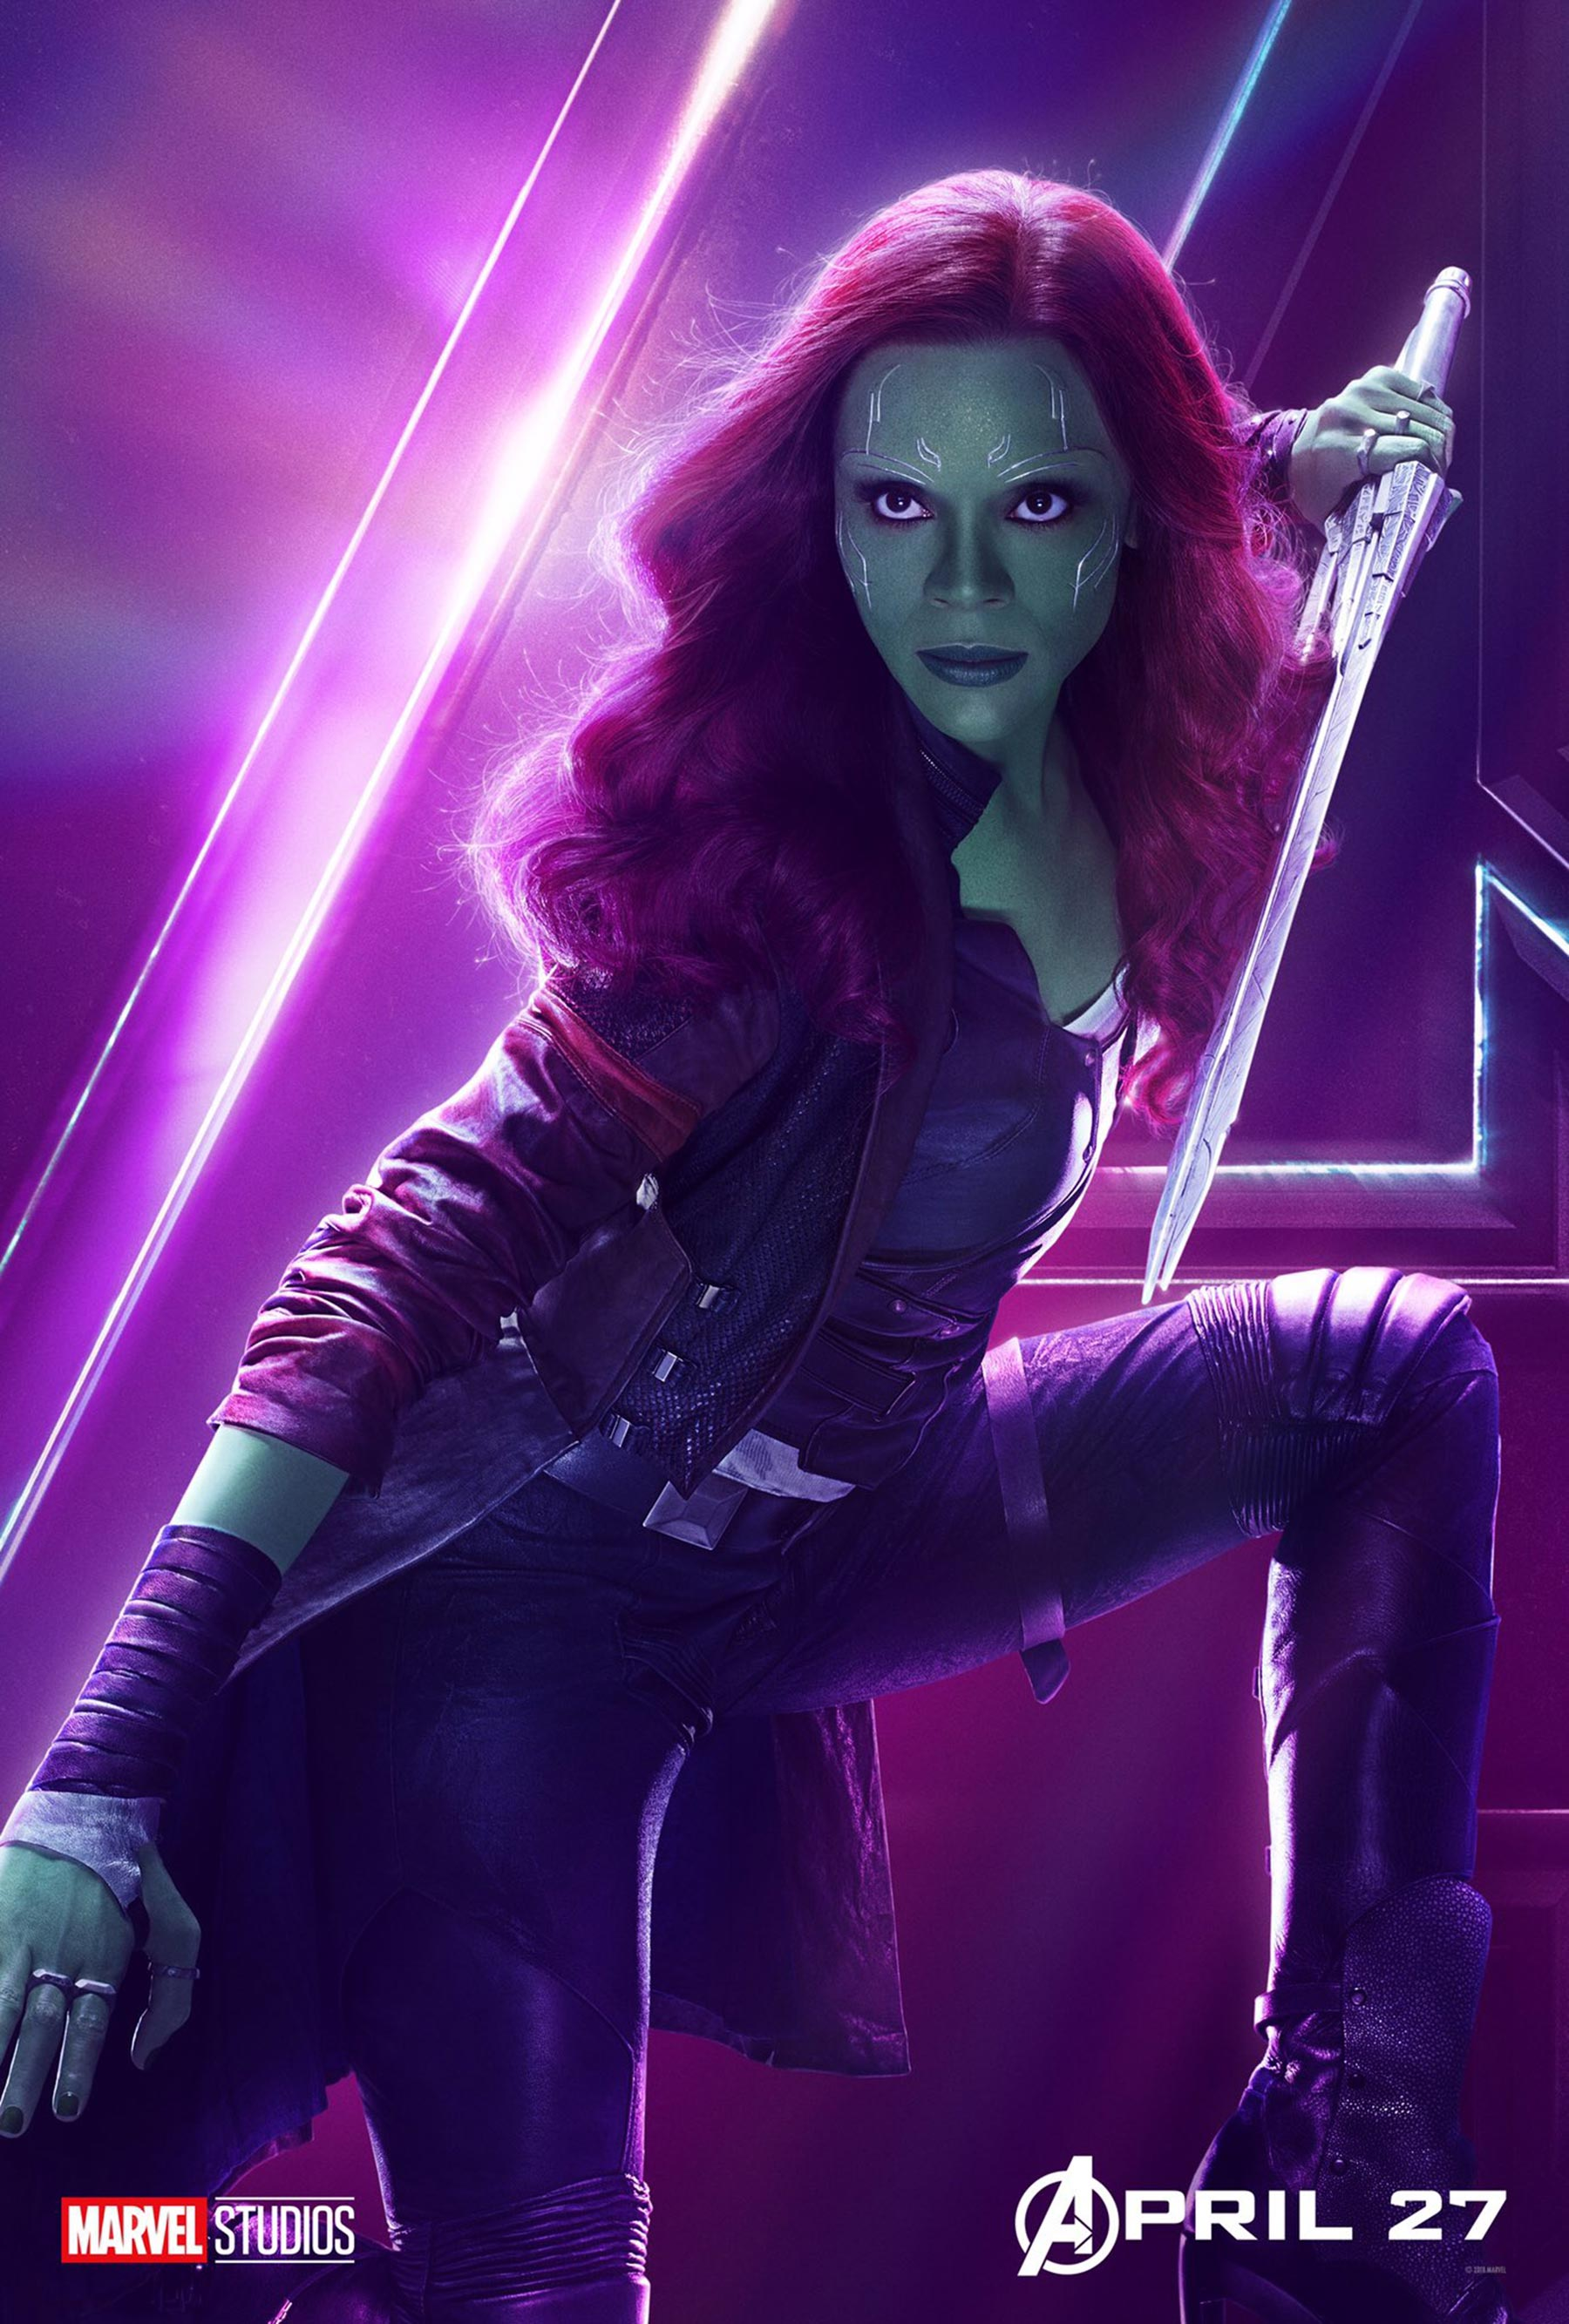 Marvel Drops 21 New AVENGERS INFINITY WAR Character